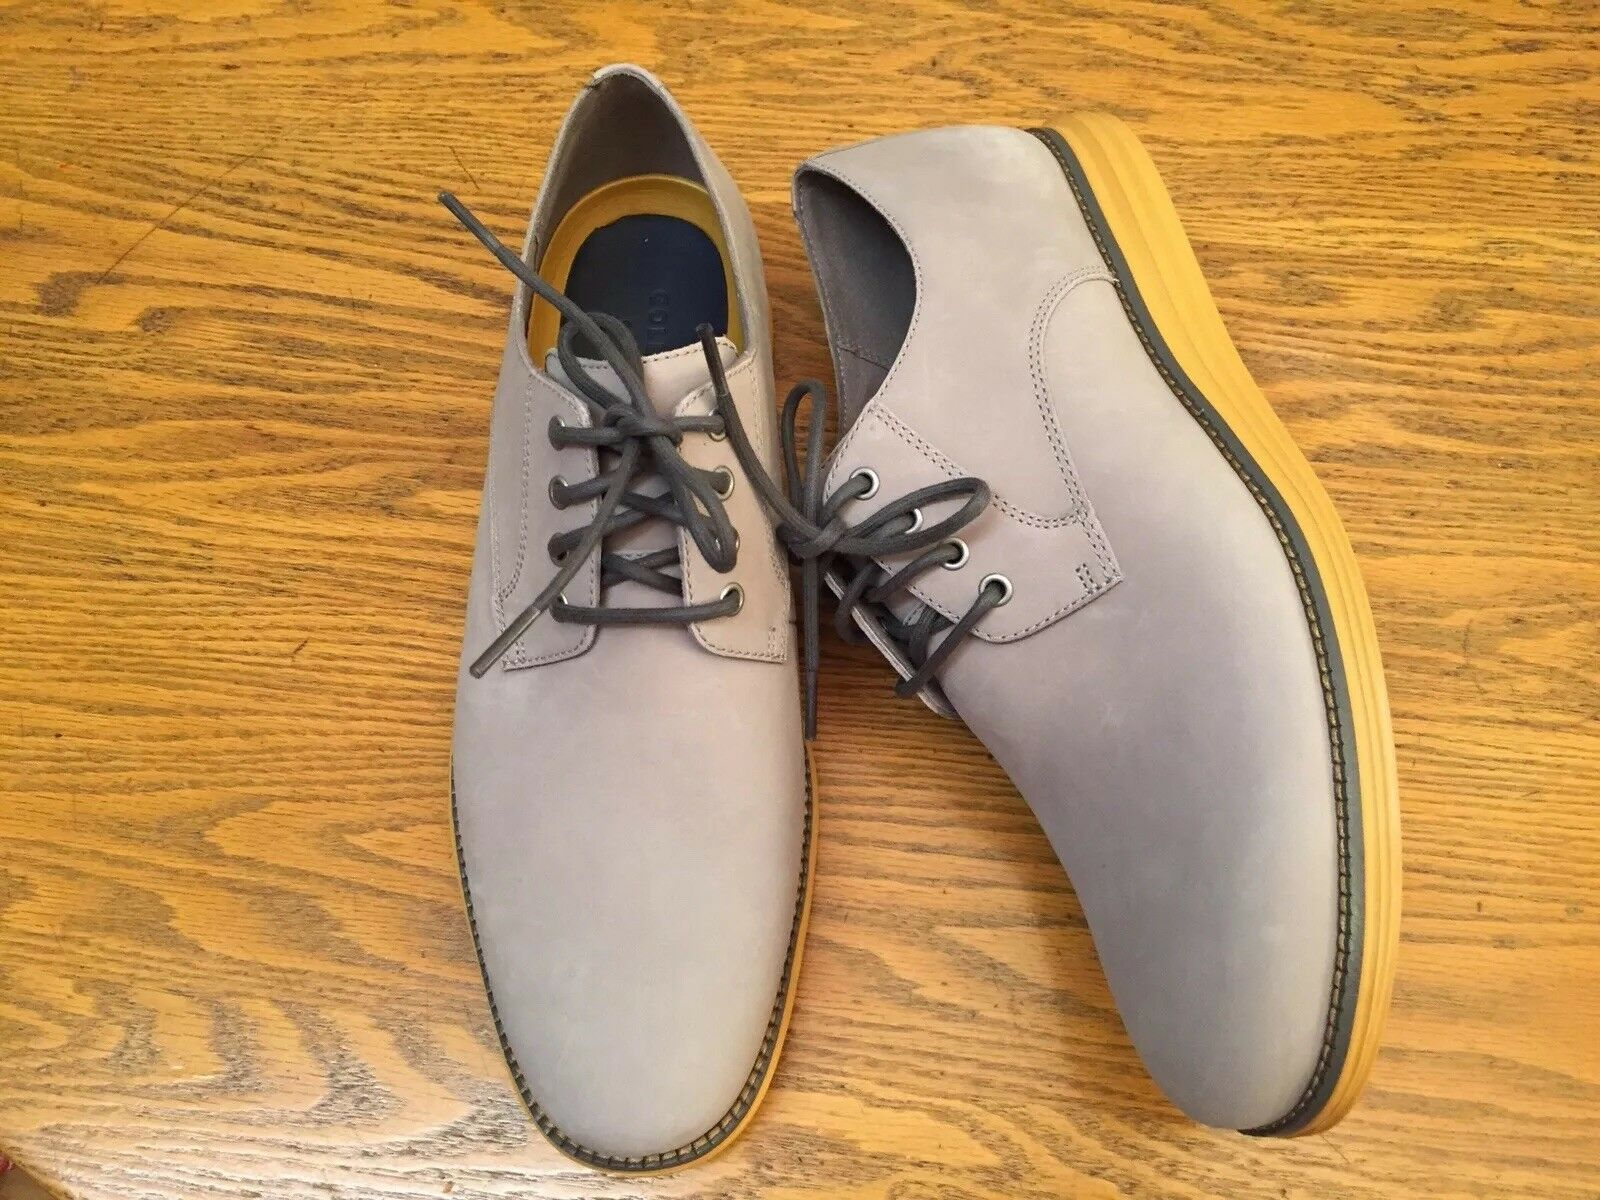 COLE HAAN GRAND ORIGINAL Plain Toe Oxford Chaussures C27443 neuf sans boîte Taille 10